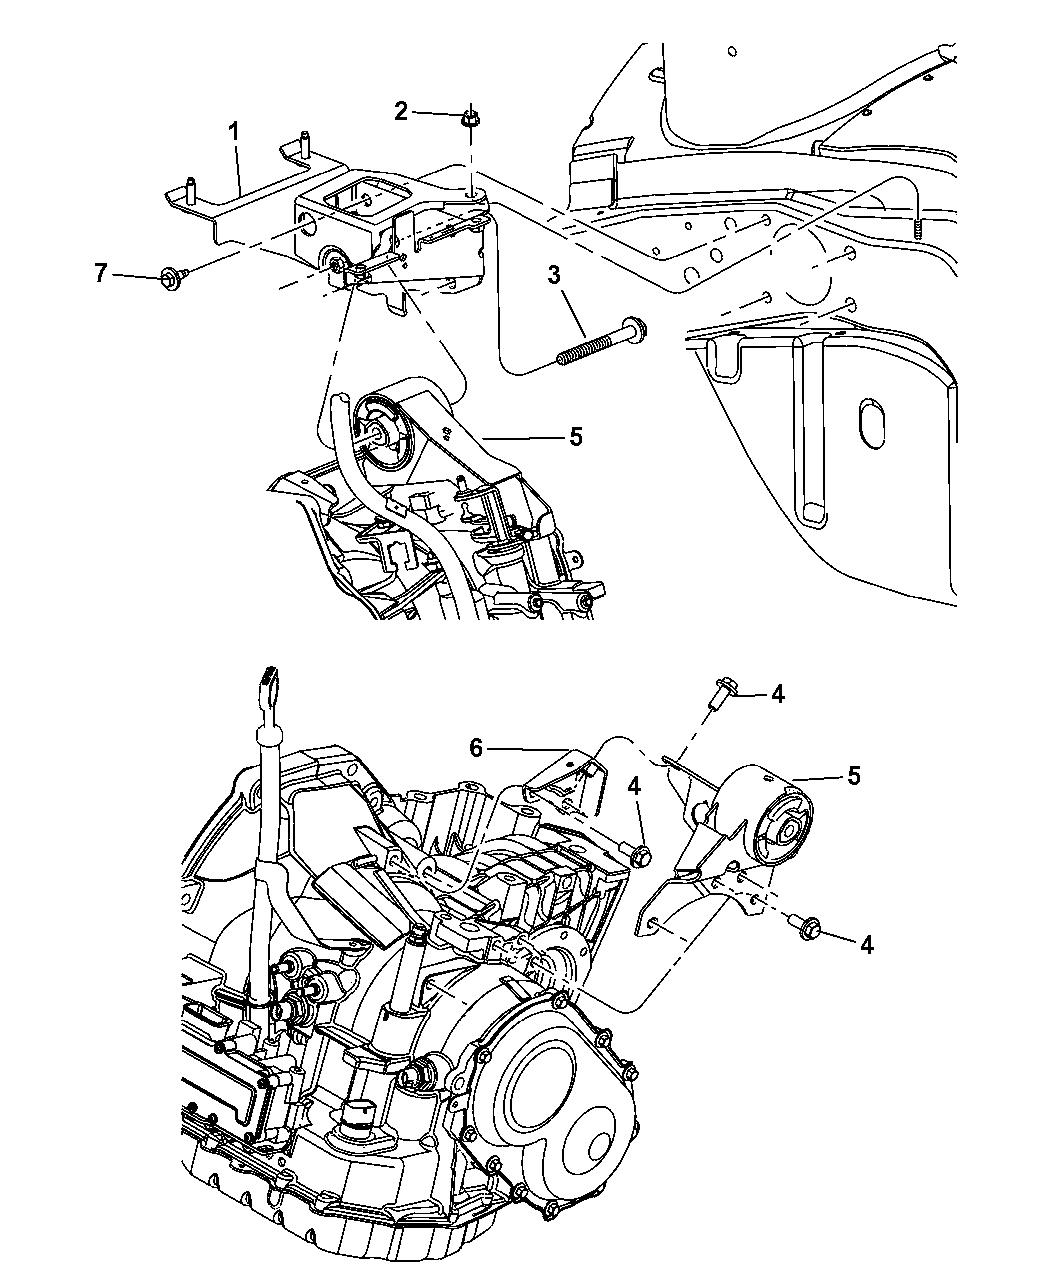 dodge neon engine parts diagram 2002 dodge neon engine diagram wiring diagram data  2002 dodge neon engine diagram wiring